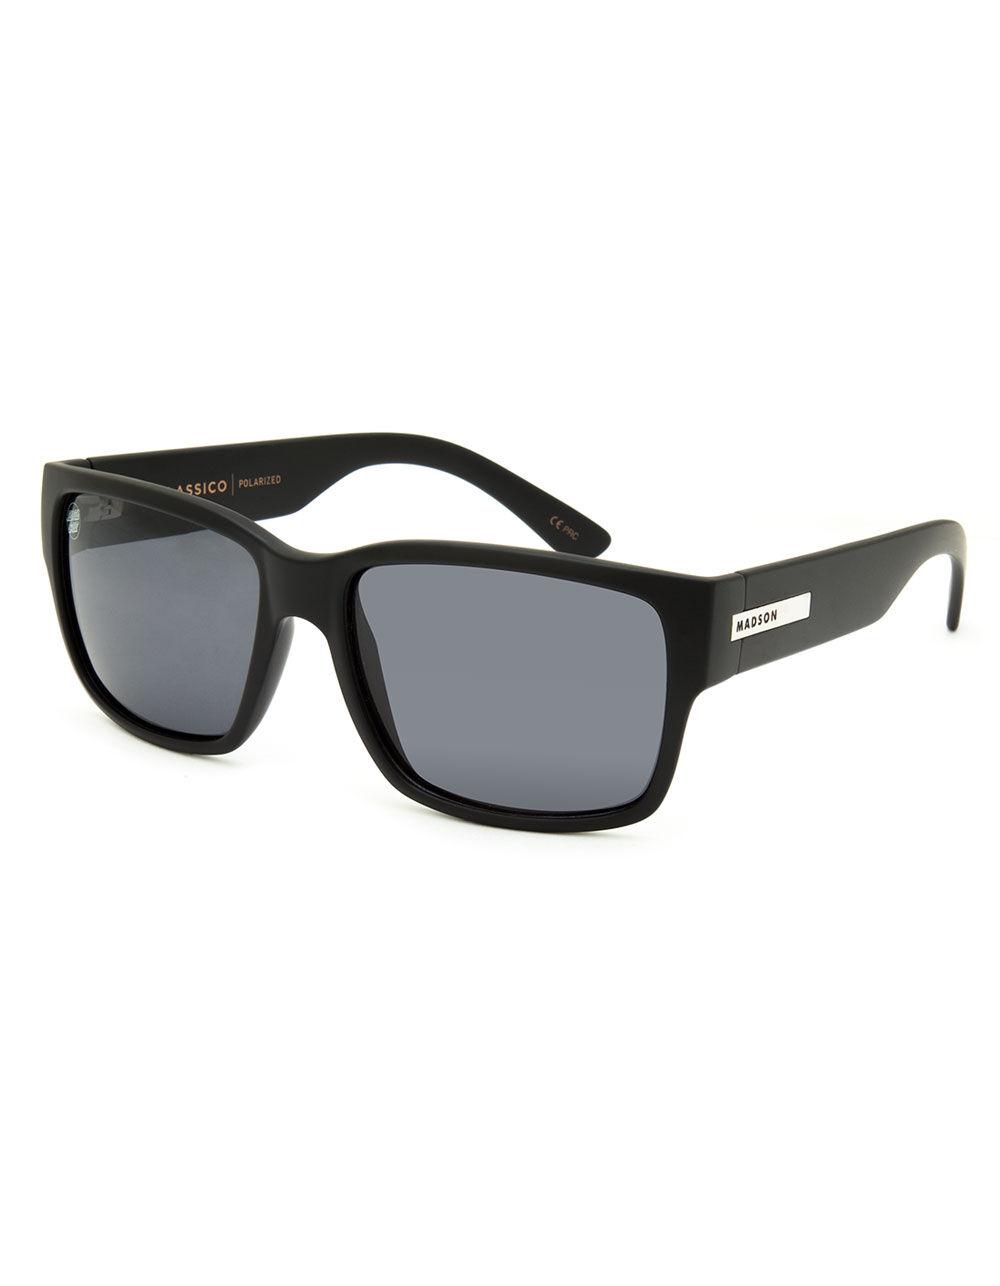 MADSON x SANTA CRUZ Classico Polarized Sunglasses